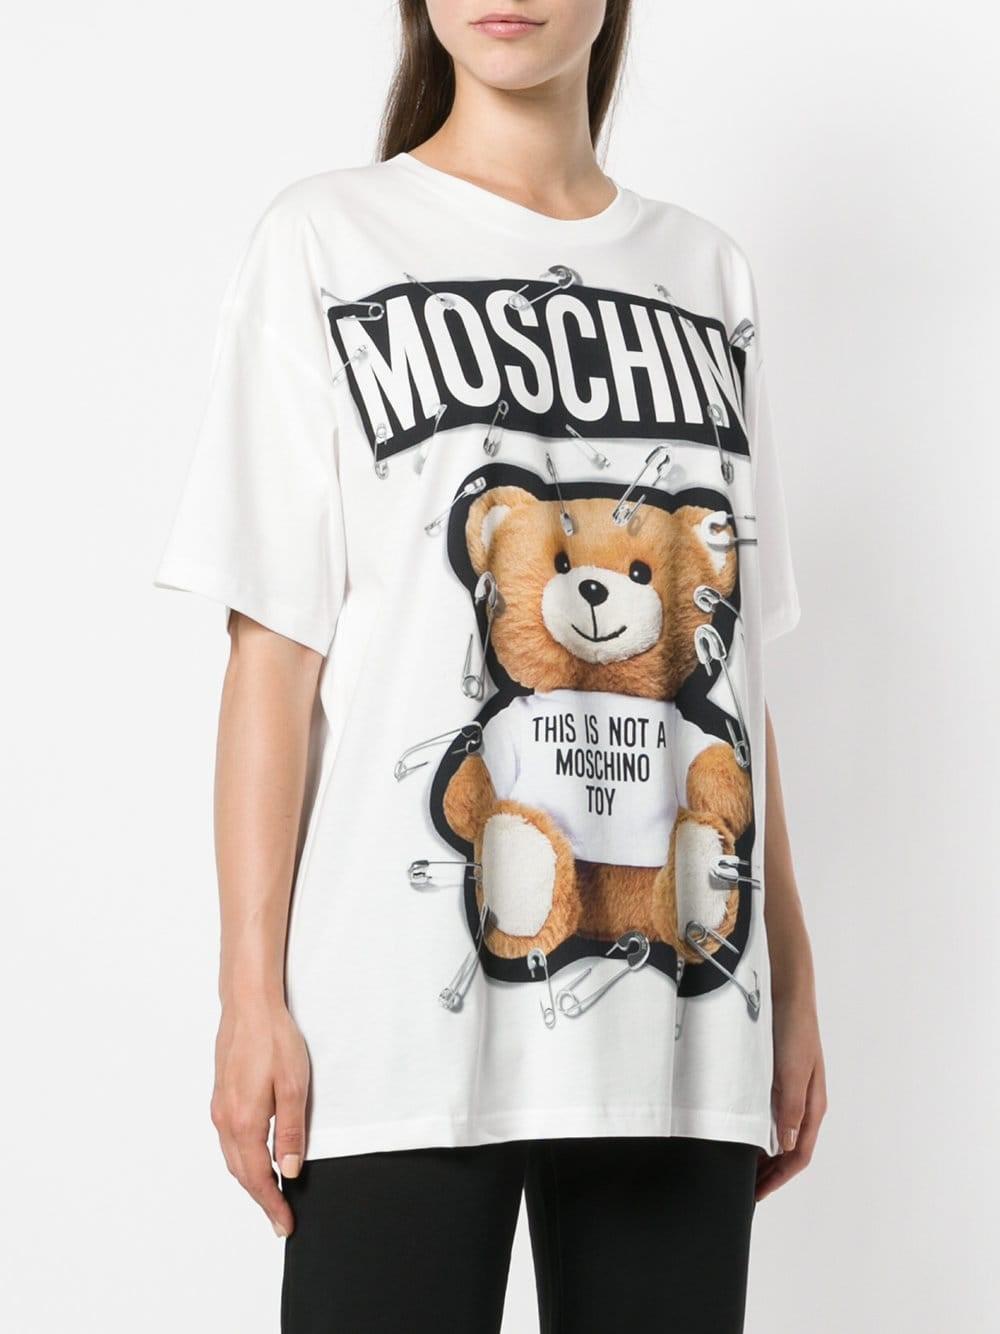 378785707e8 moschino TEDDY BEAR T-SHIRT available on montiboutique.com - 24014